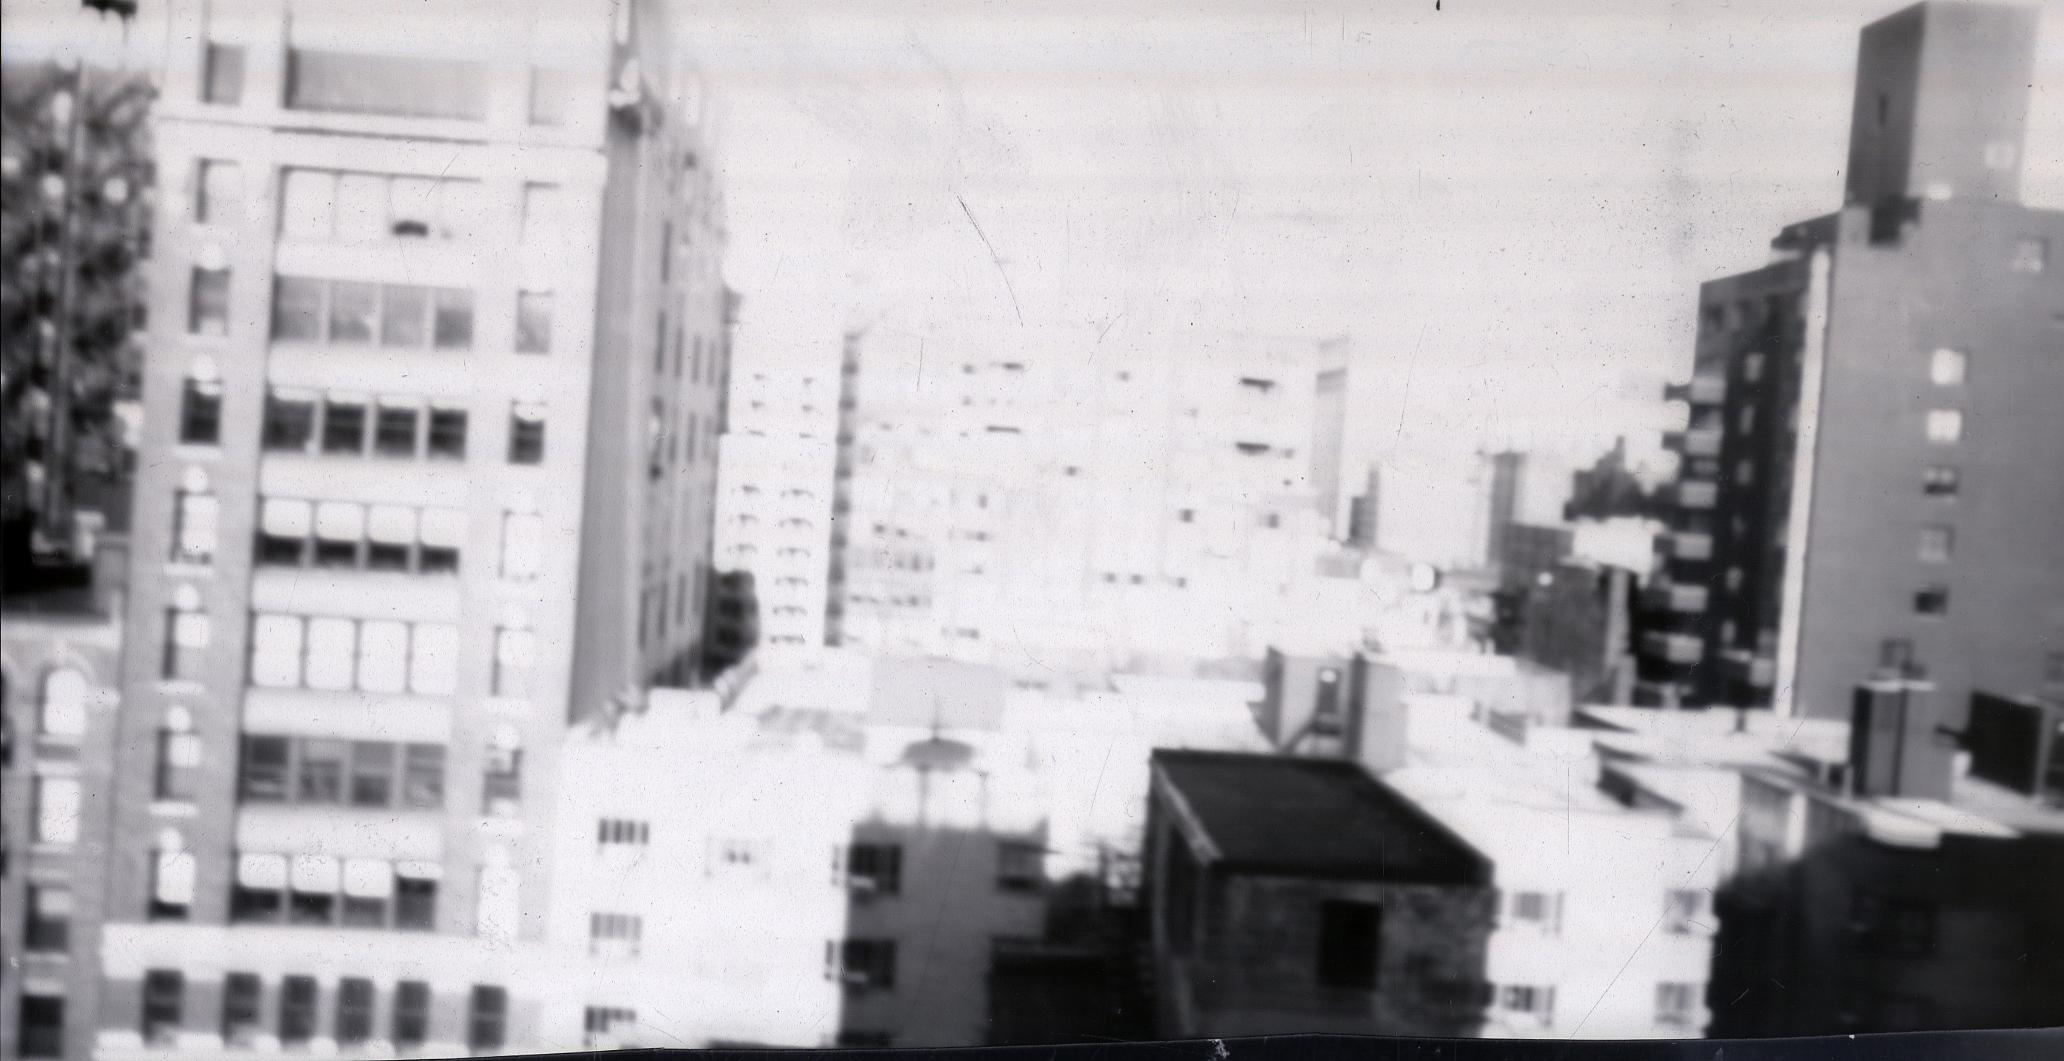 Pinhole Book - 35mm B/W Film - 30 second exposure